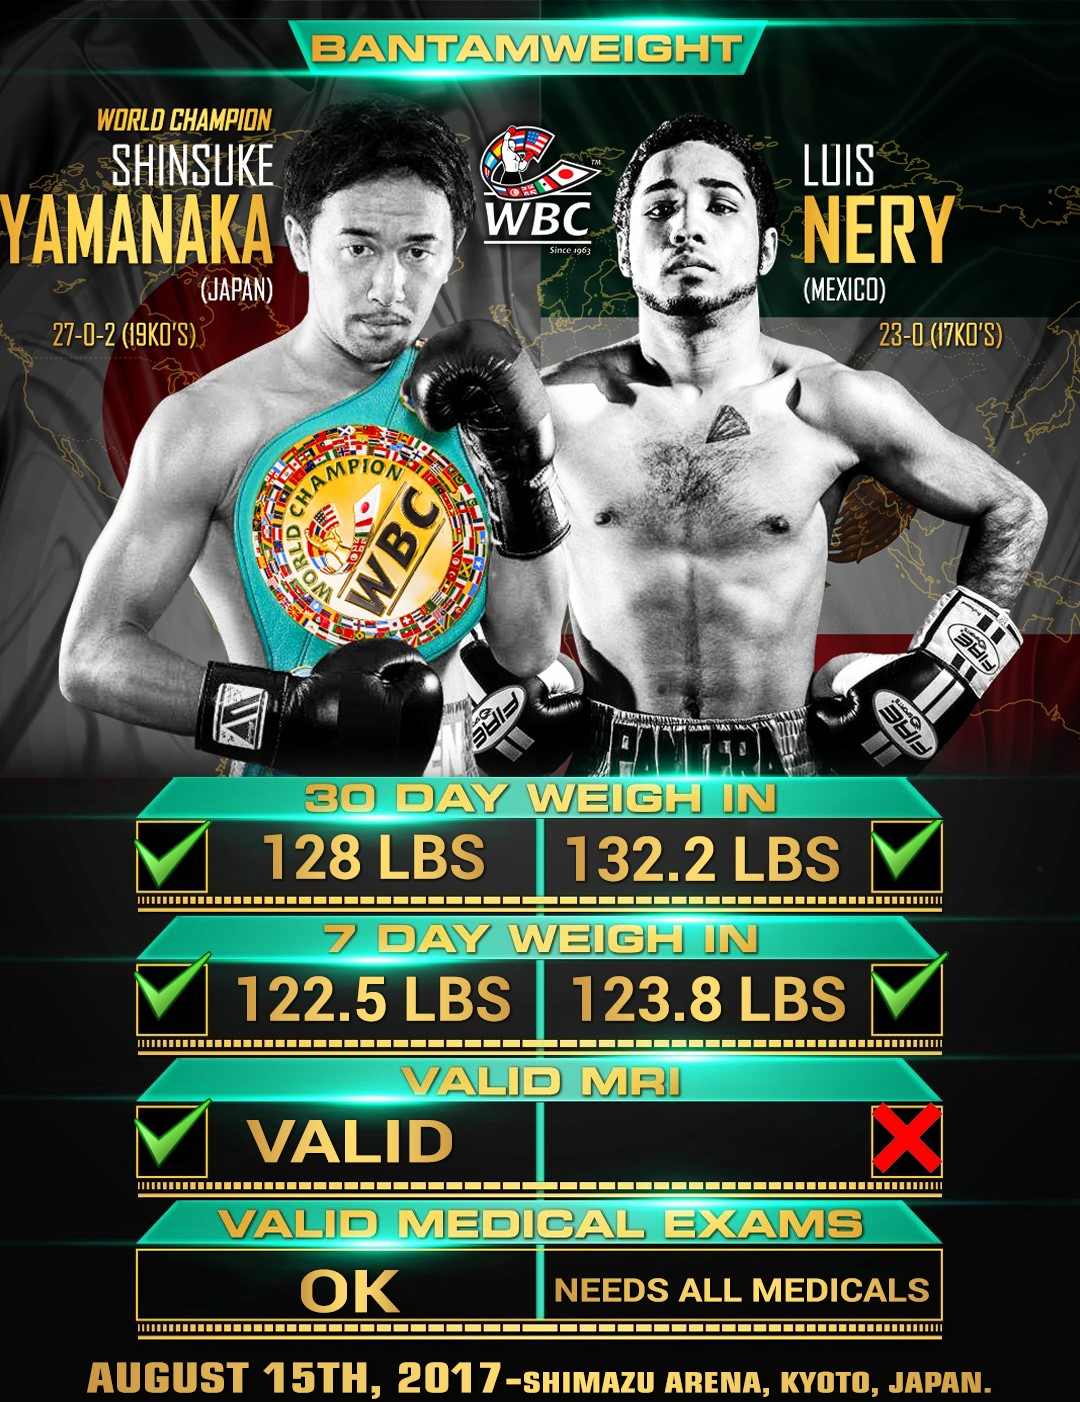 yamanaka-nery-kt-1